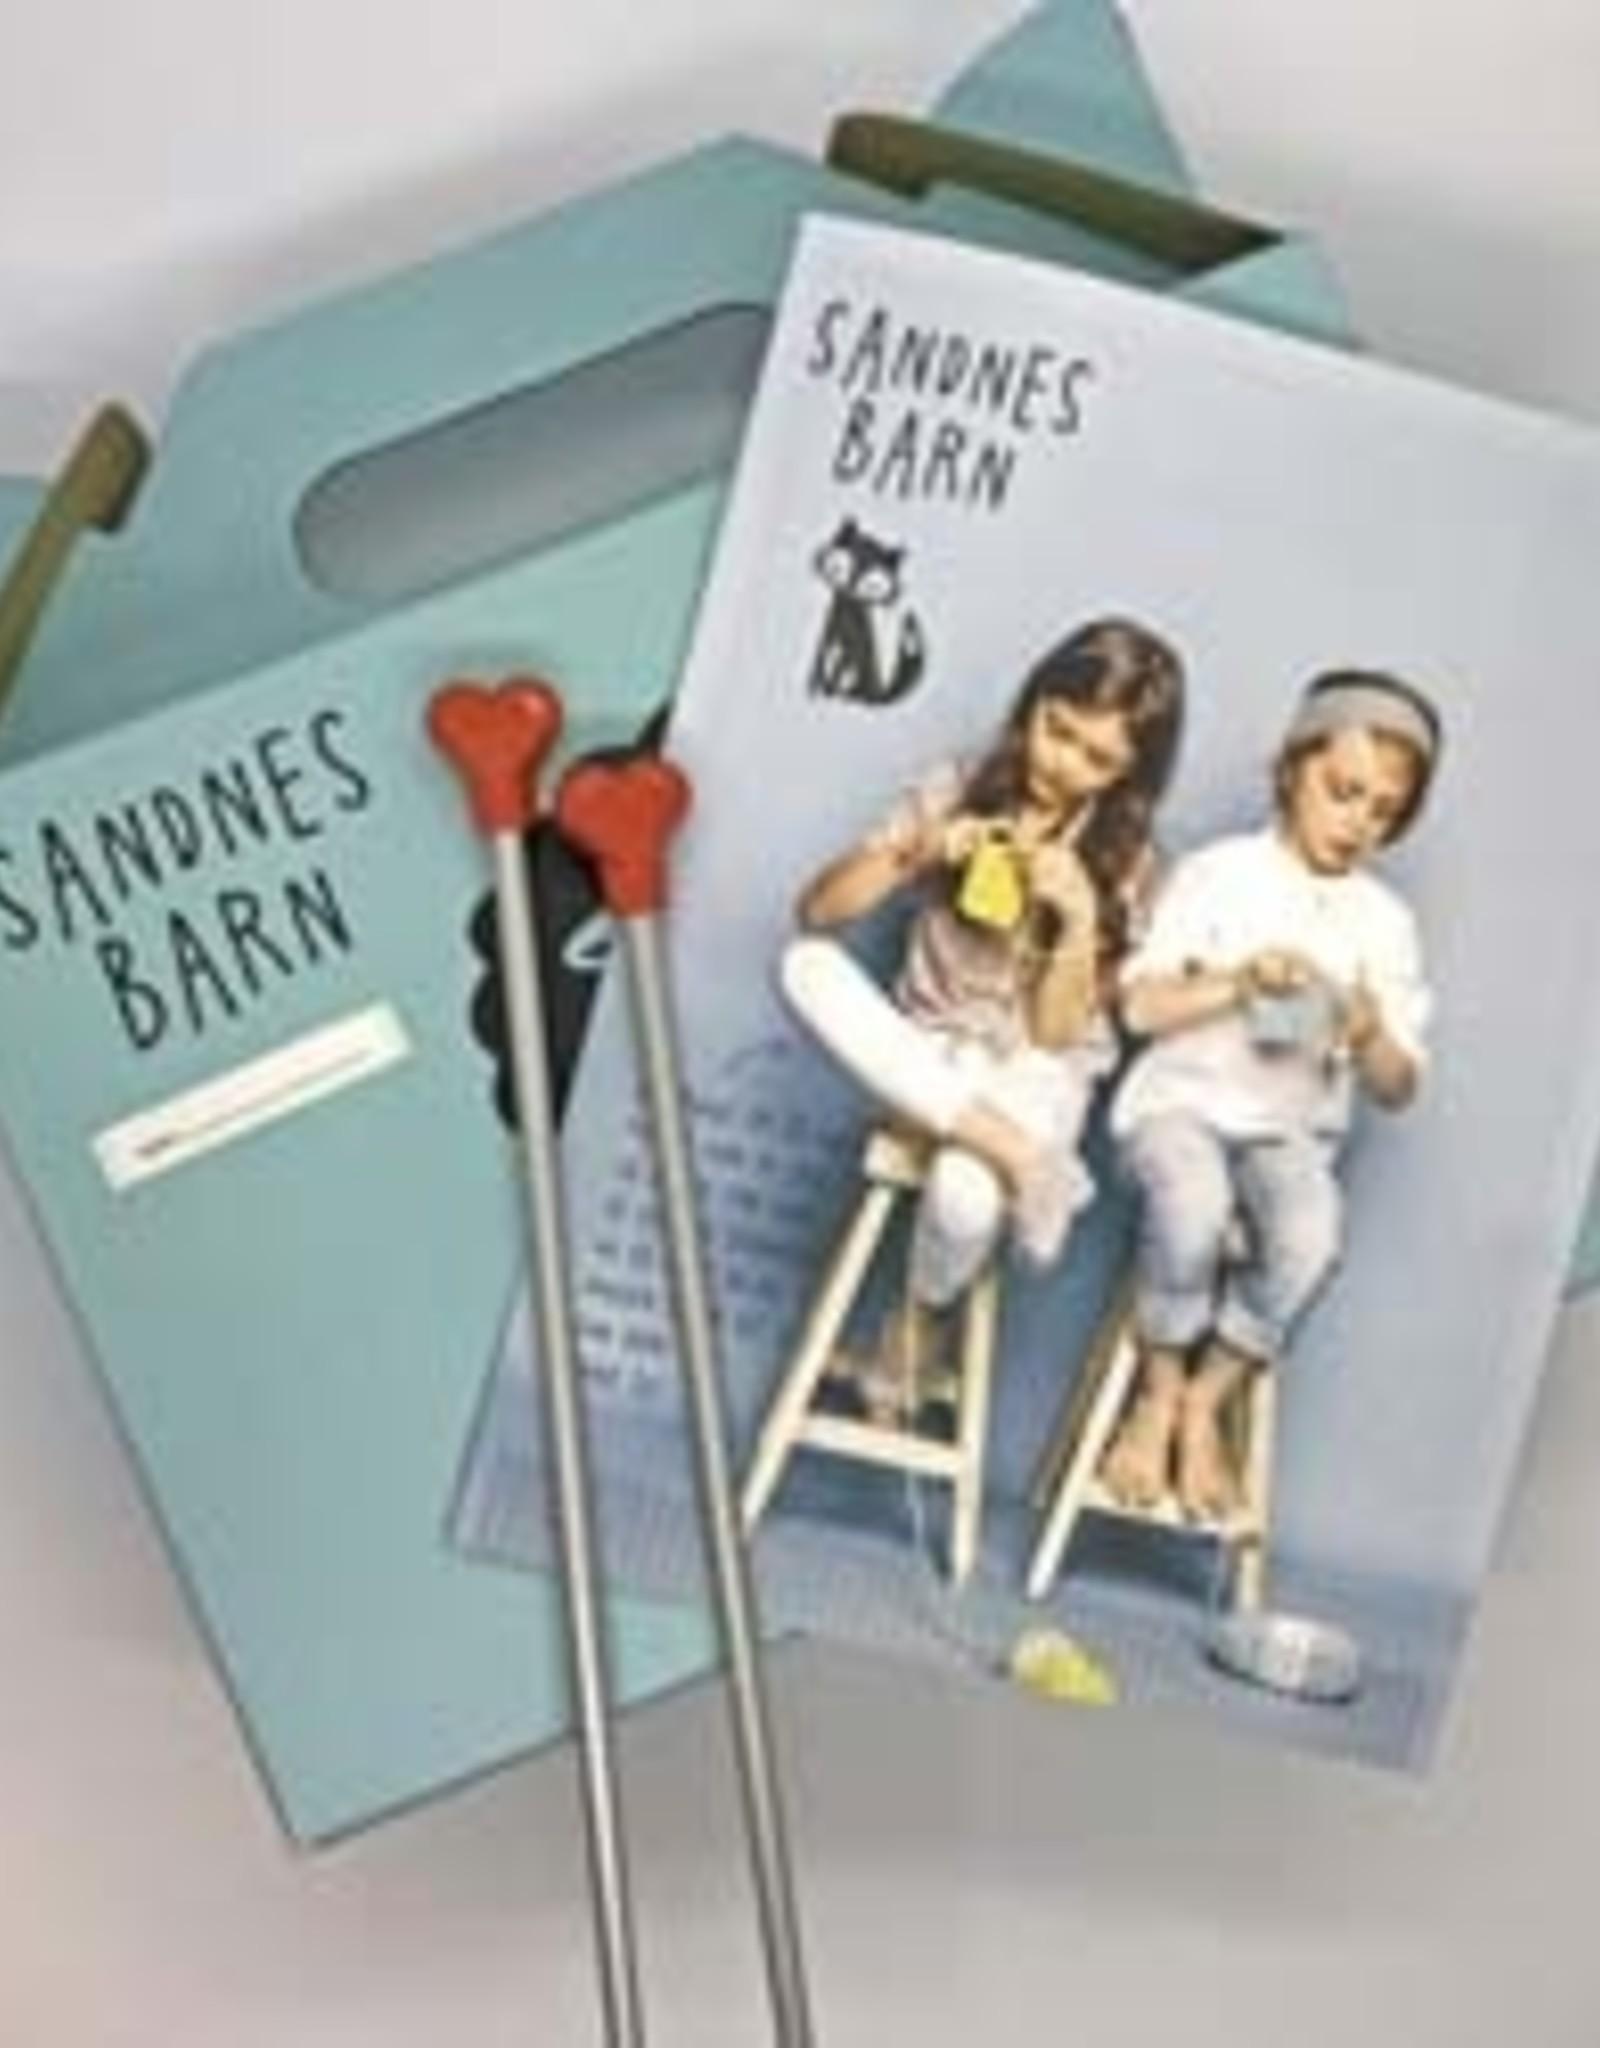 Sandnes Garn Kid's Knitting Kit - Teddy Brown / Party Pink